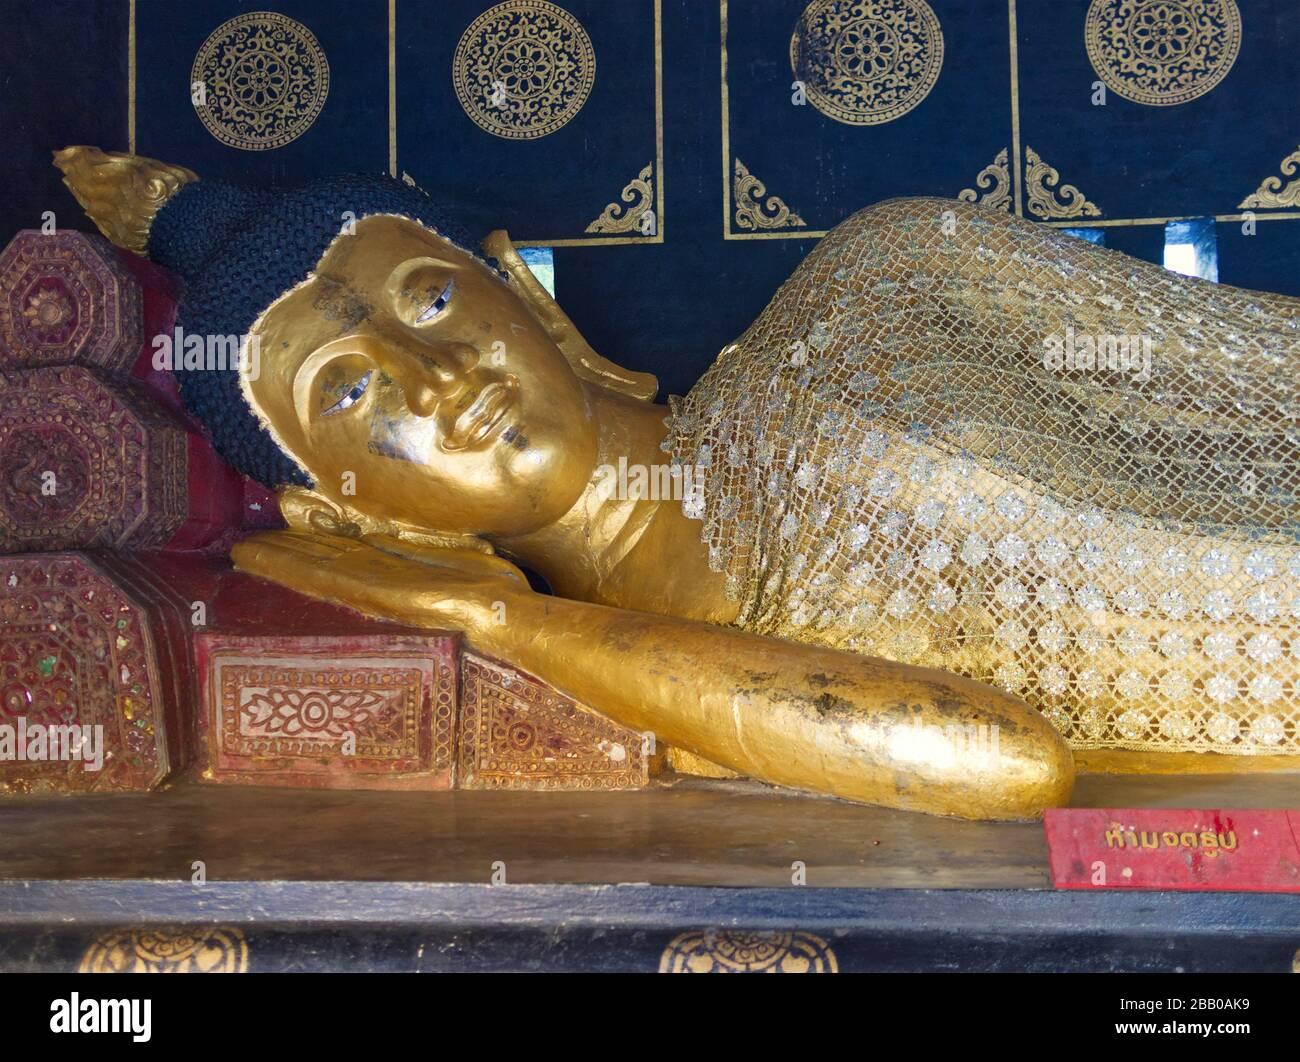 reclining Buddah, Wat Phra Singh, Chiang Mai, Thailand. Stock Photo